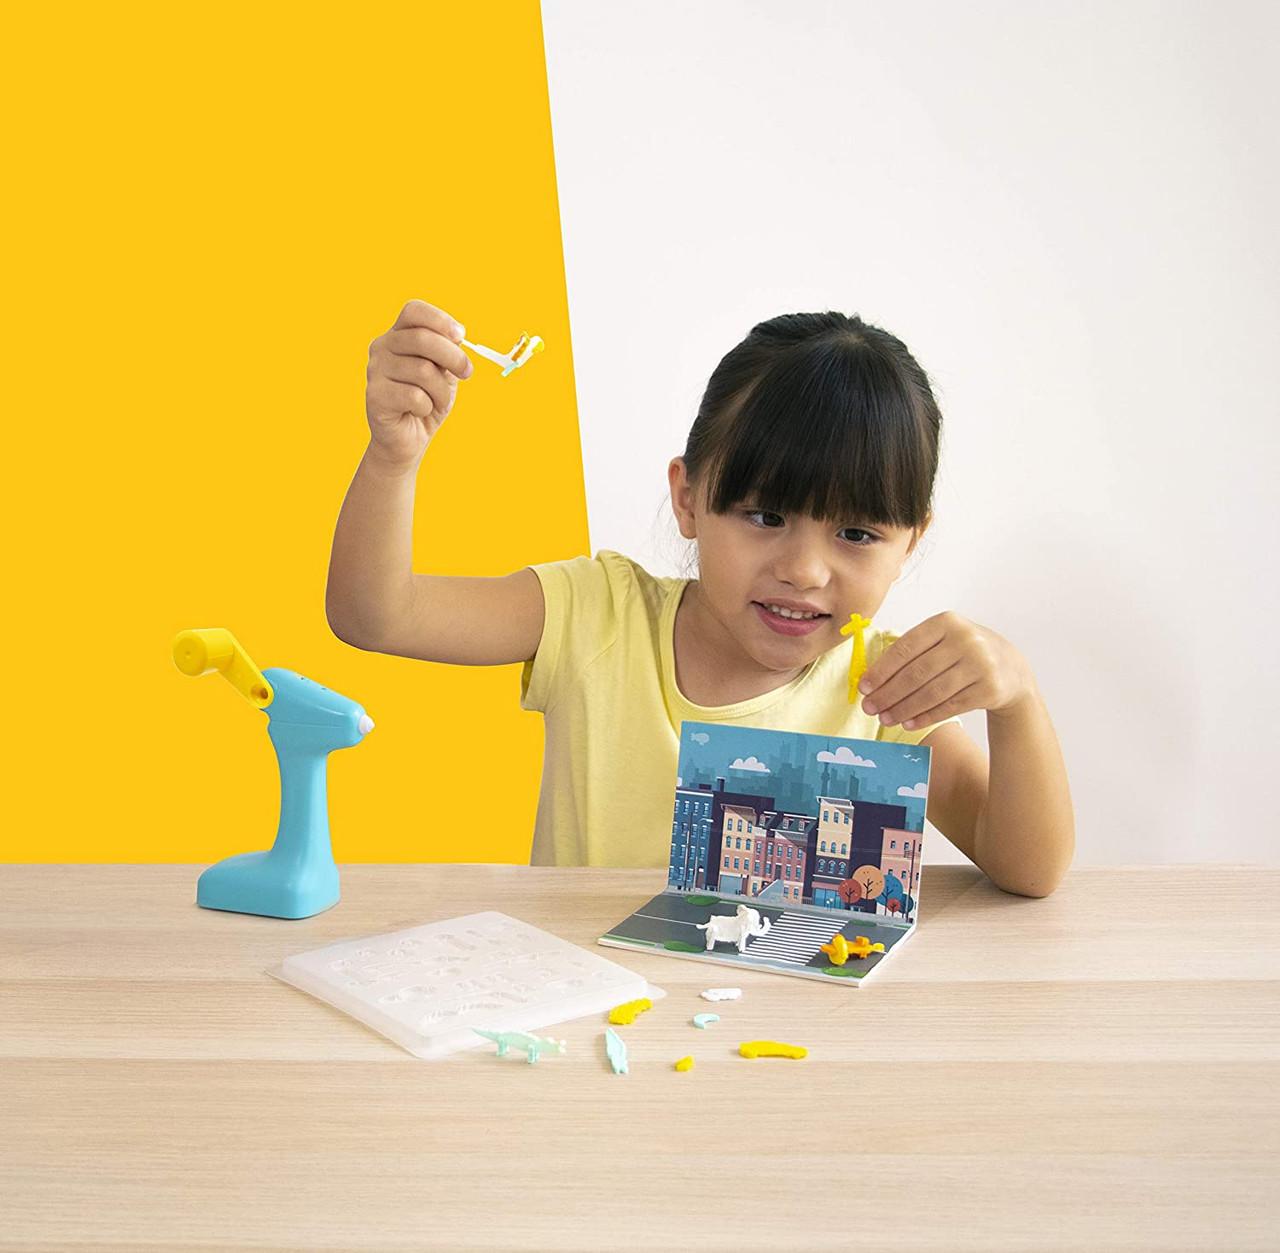 3Doodler 0JPSJUBE1R 3D Build and Play Printing Pen Education Art Tool for Kids